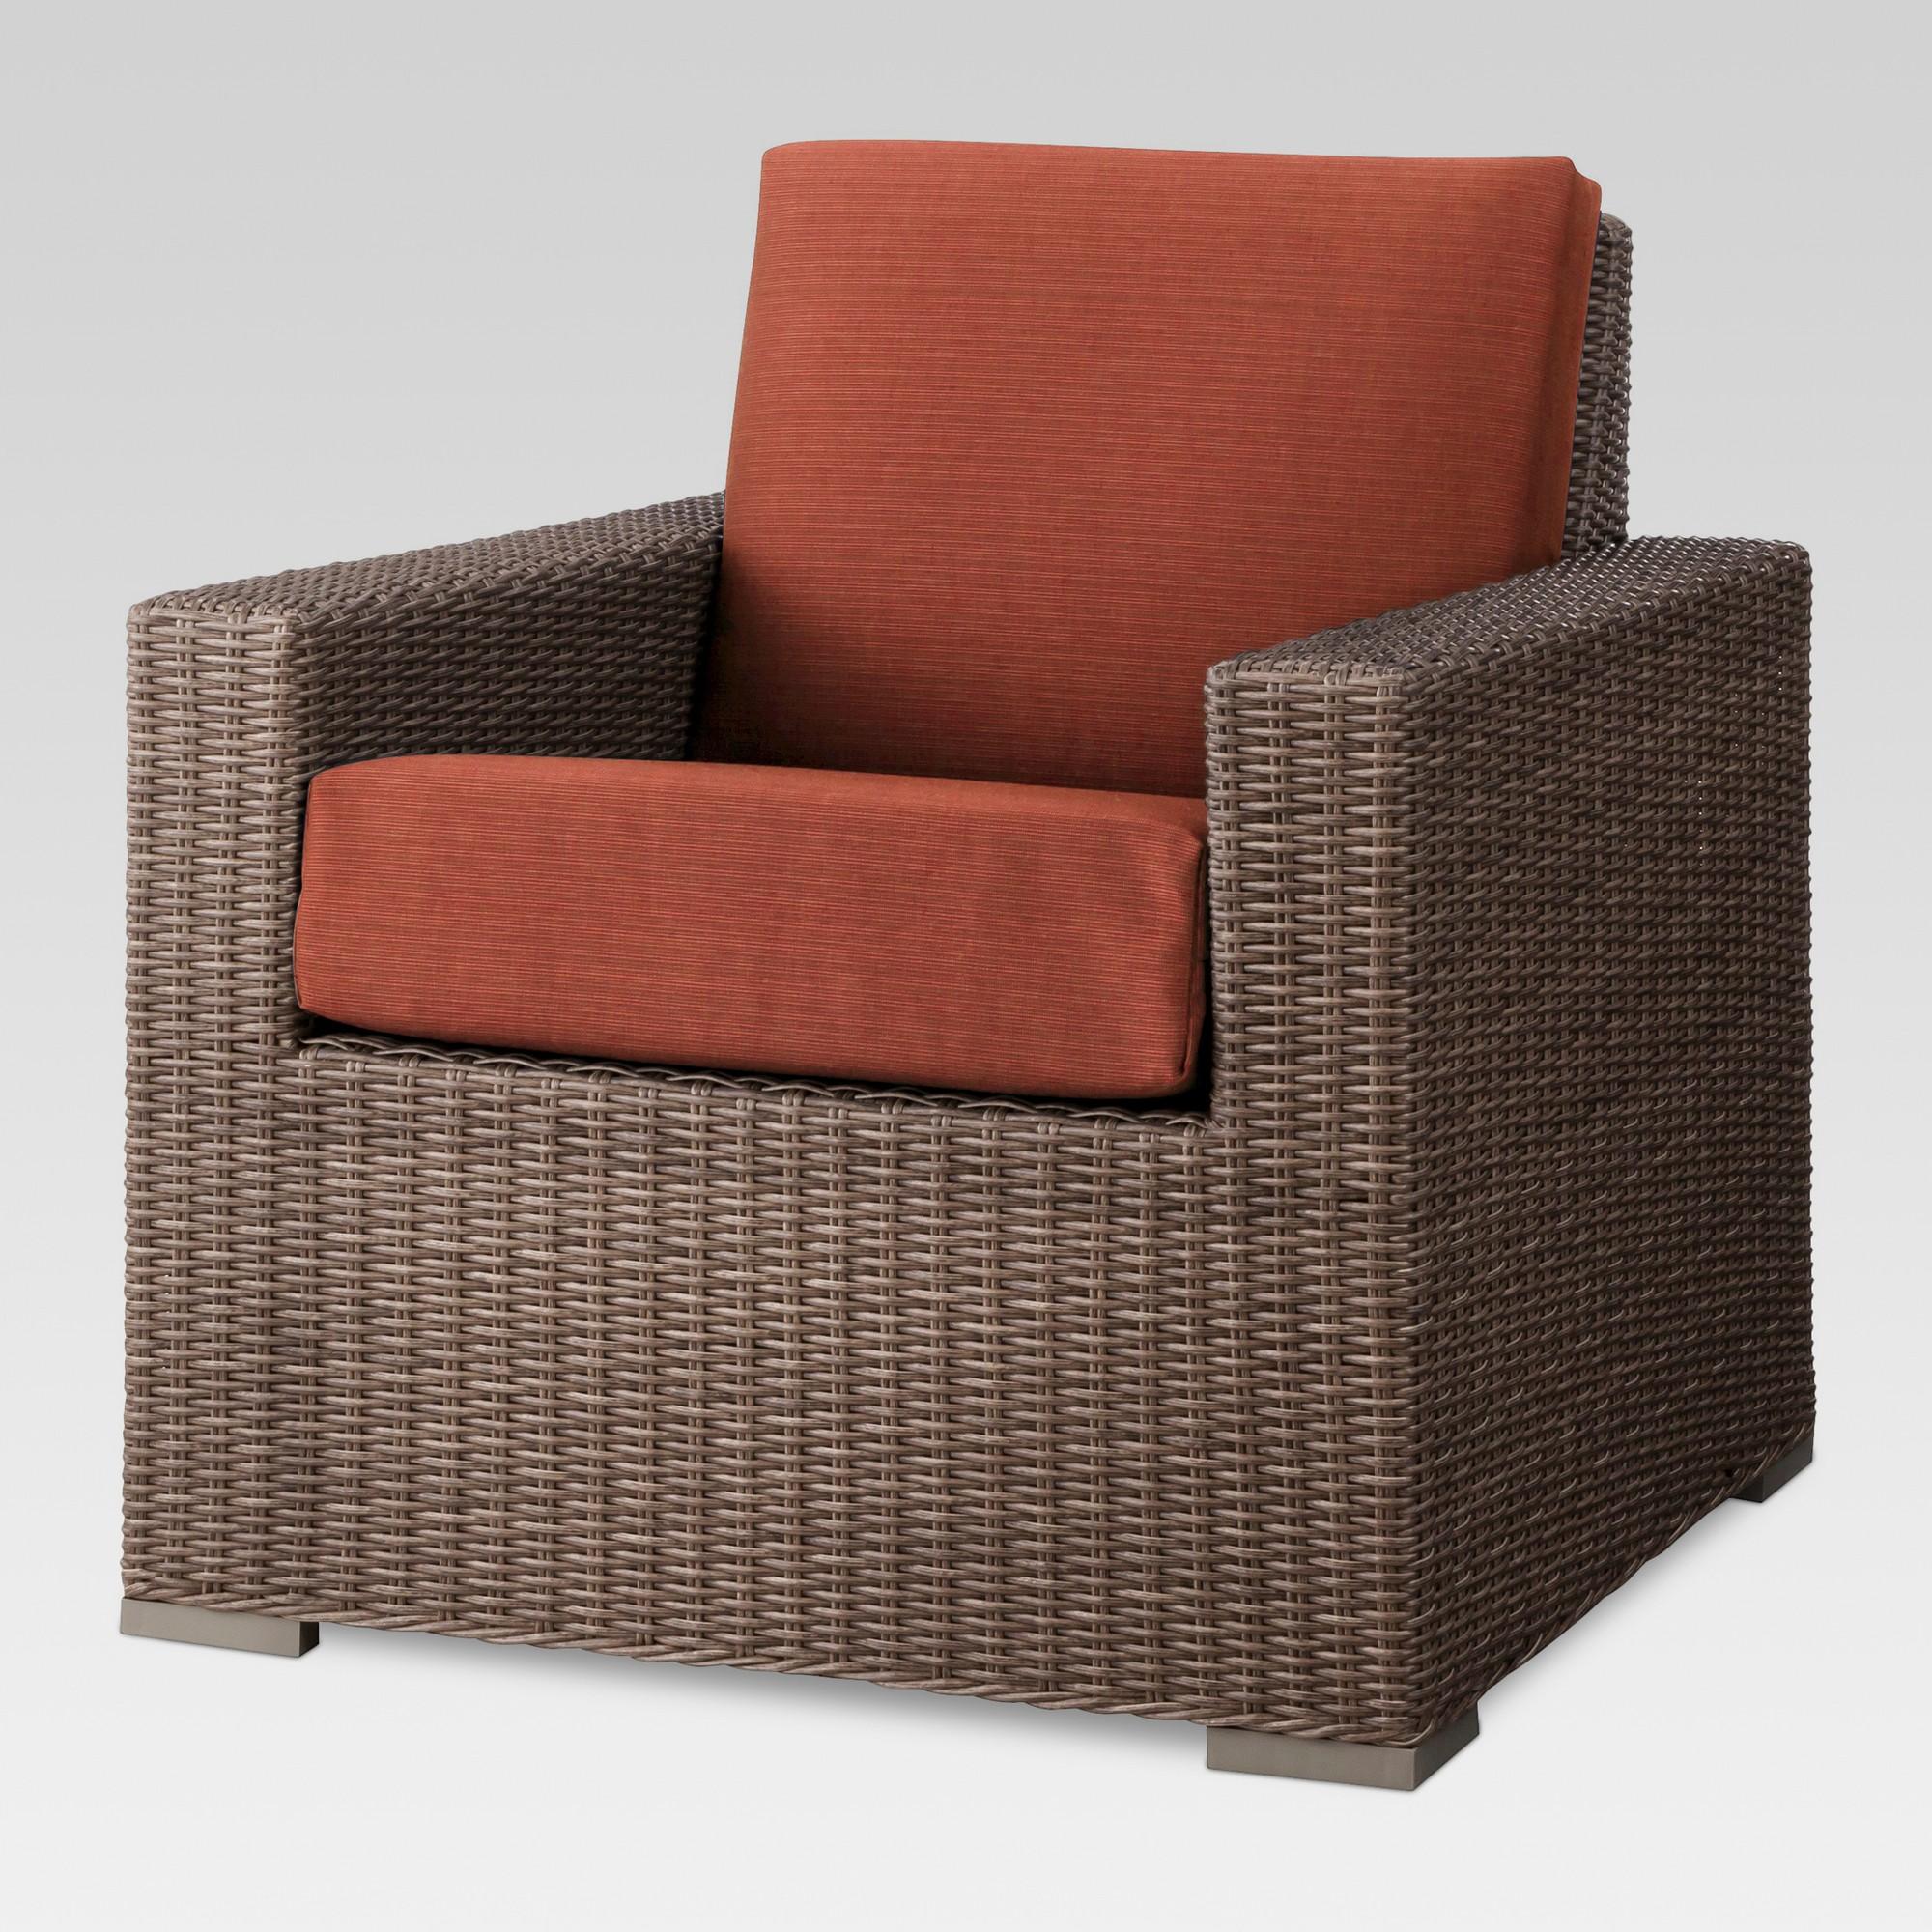 Heatherstone wicker patio club chair orange threshold